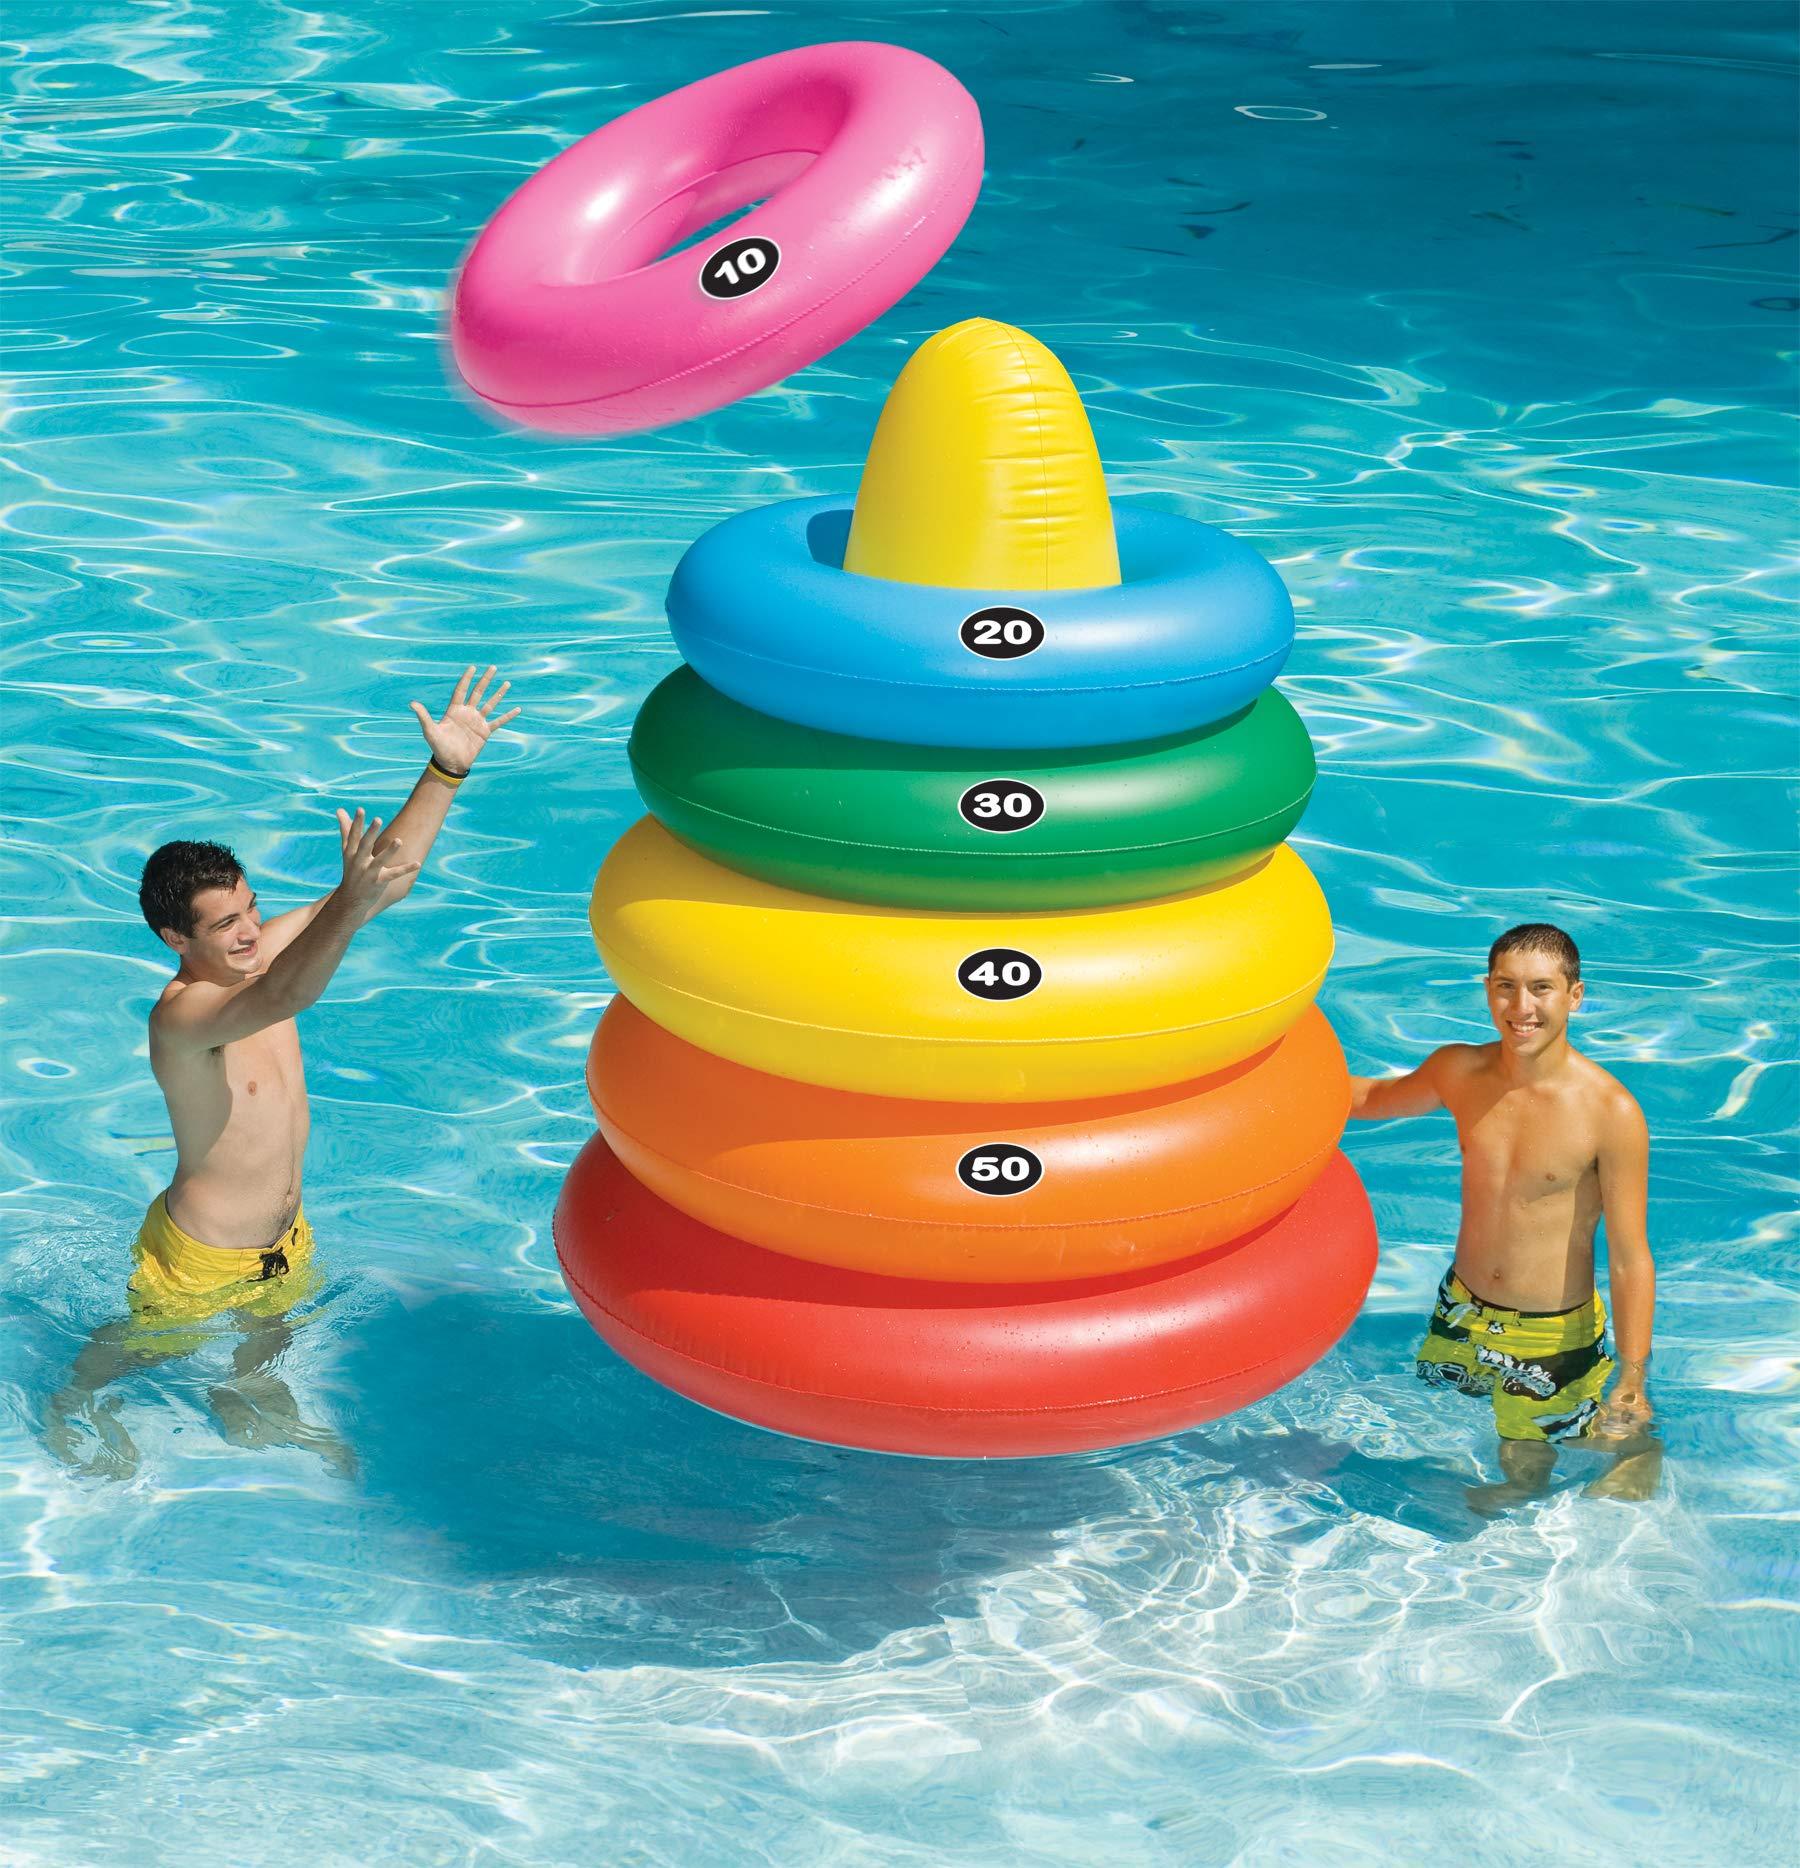 Swimline Giant Ring Toss Game by Swimline